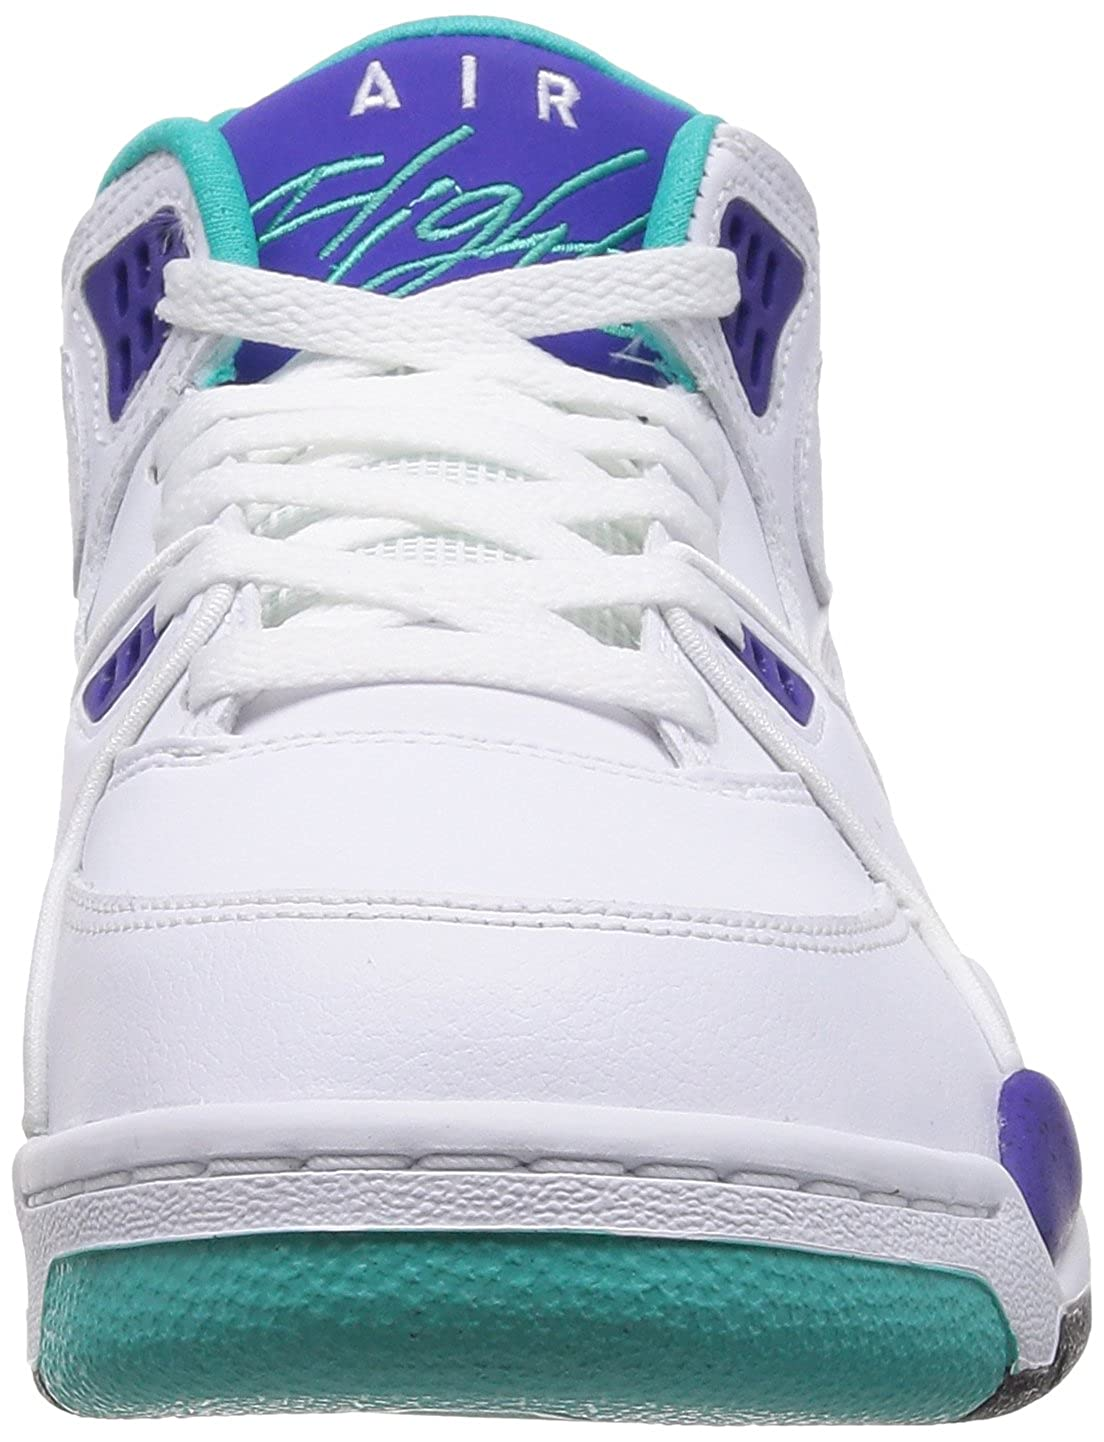 newest 22aa7 9ca61 Nike Air Flight 89 - White/White-Dark Concord-Hyper Jade, 13 D US:  Amazon.in: Shoes & Handbags